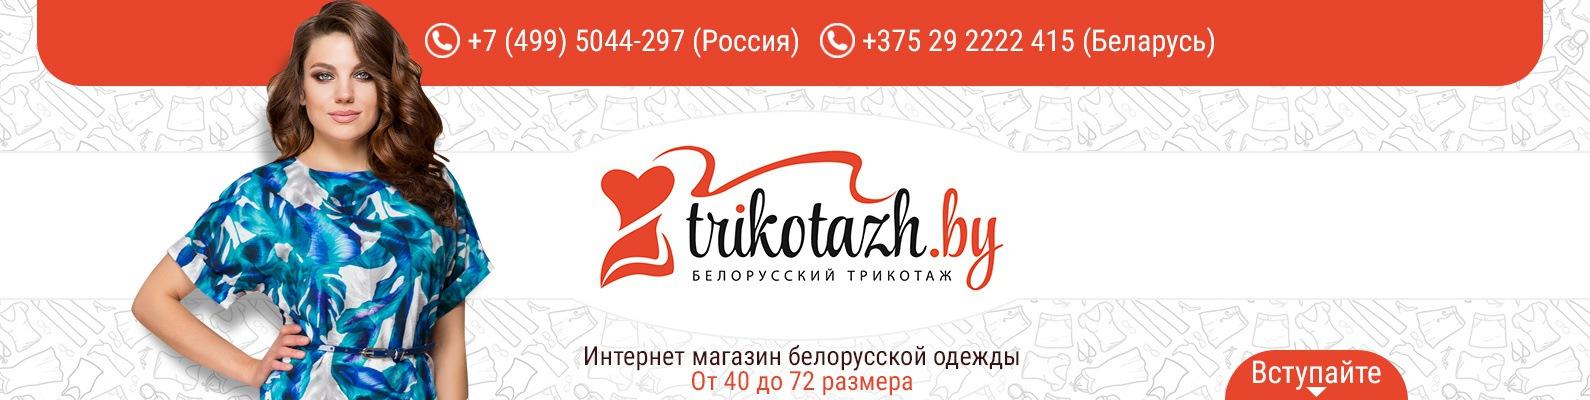 5824727faffcb Интернет магазин Трикотаж Бай.Белорусские бренды | ВКонтакте